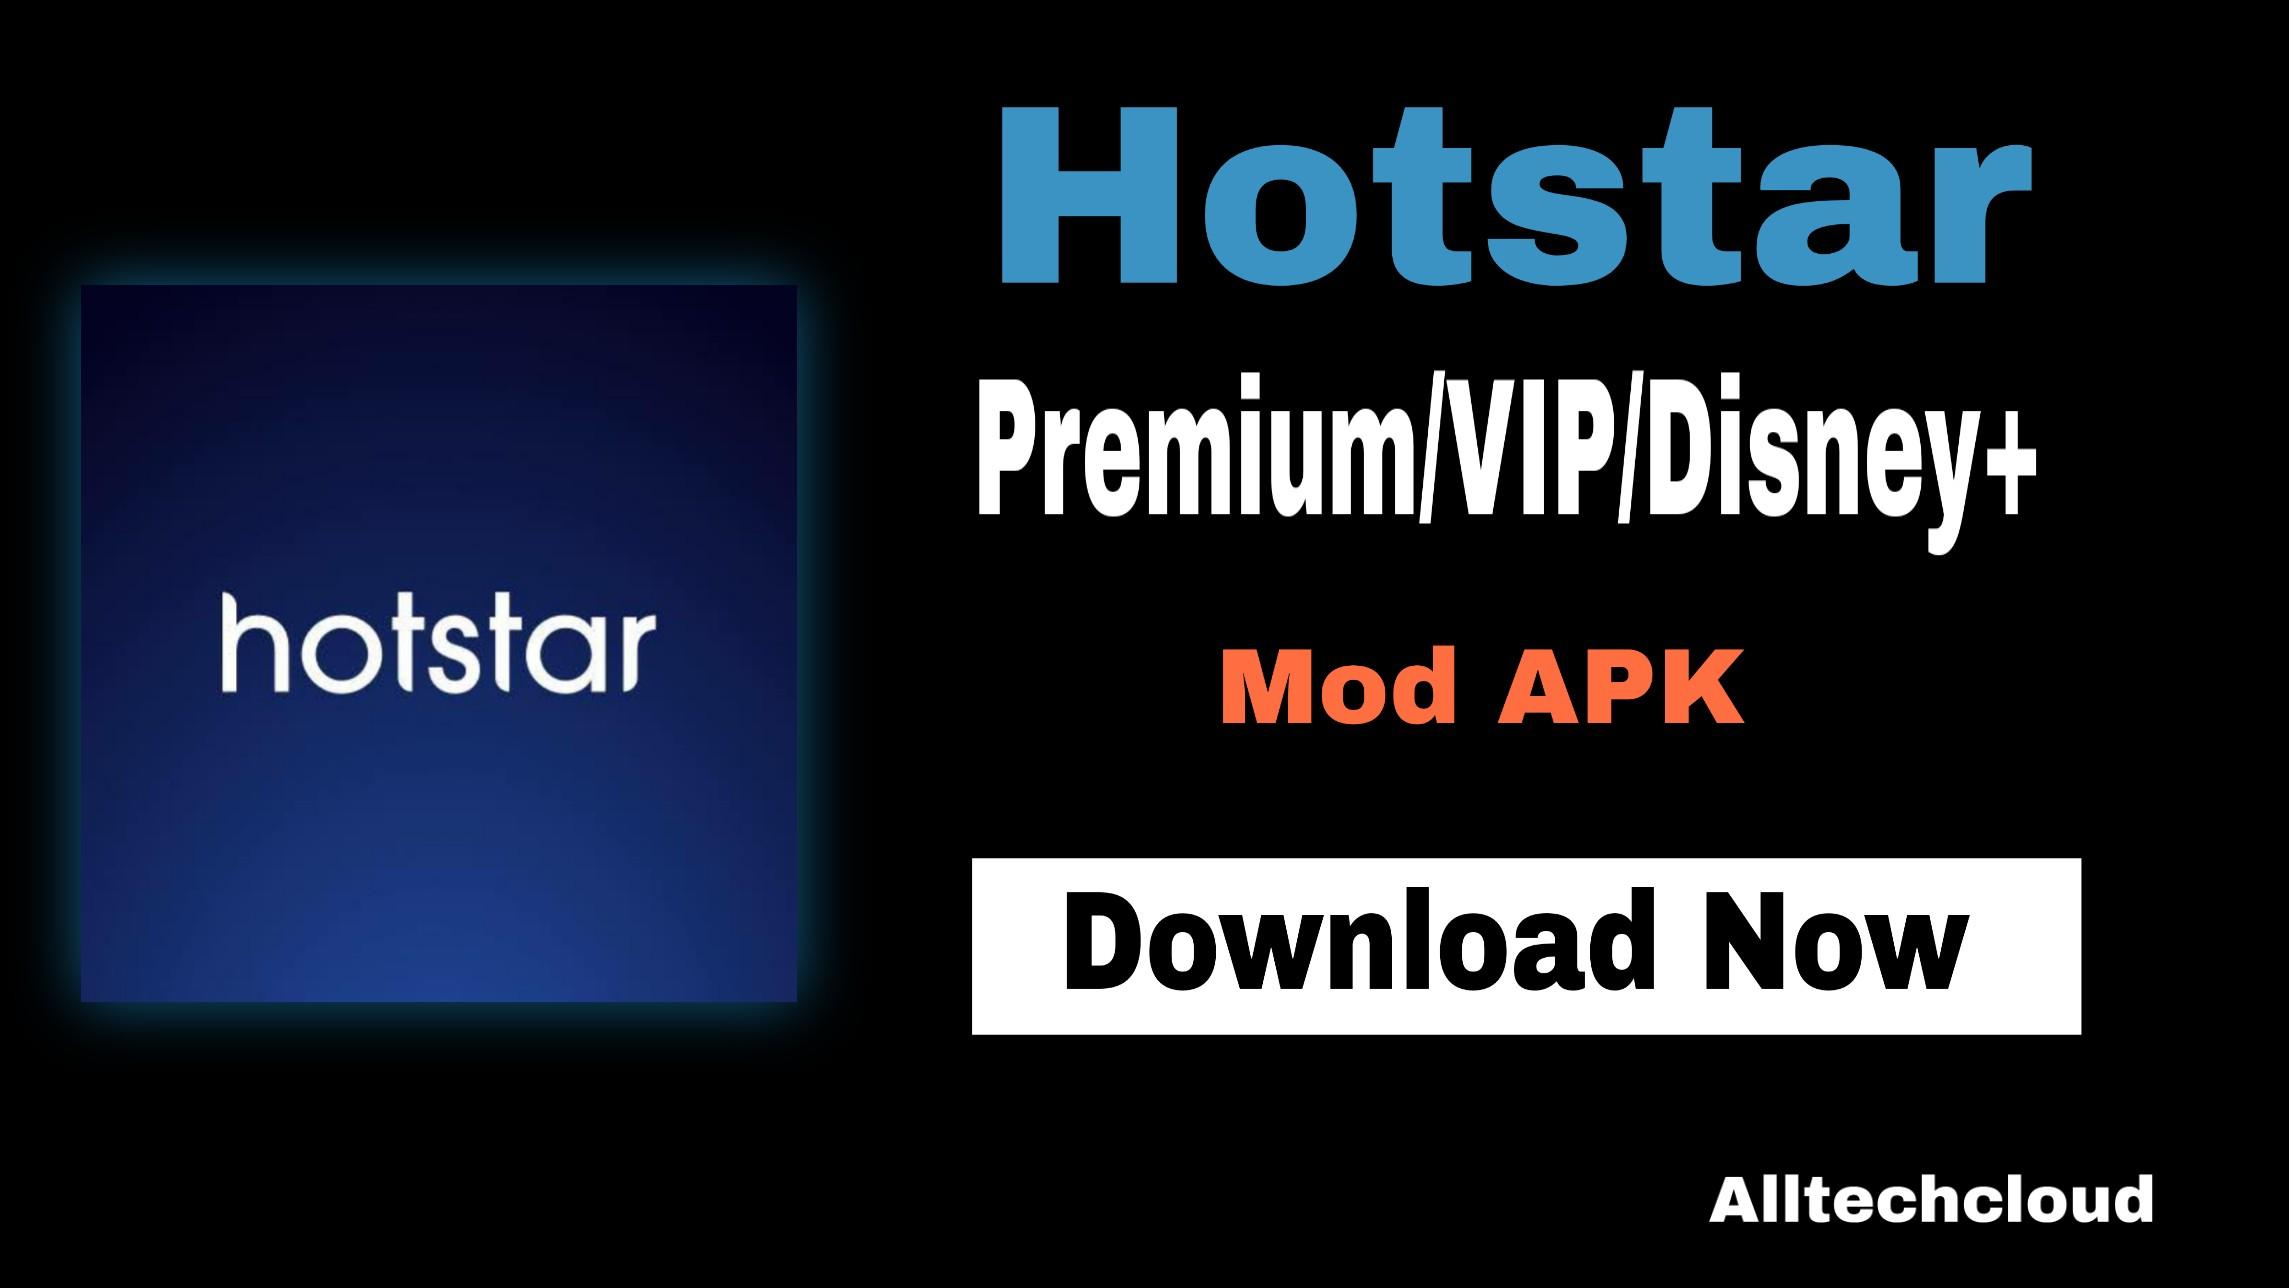 Hotstar Mod APK v12.1.8 Watch IPL 2021 Live Free (Premium Unlocked)